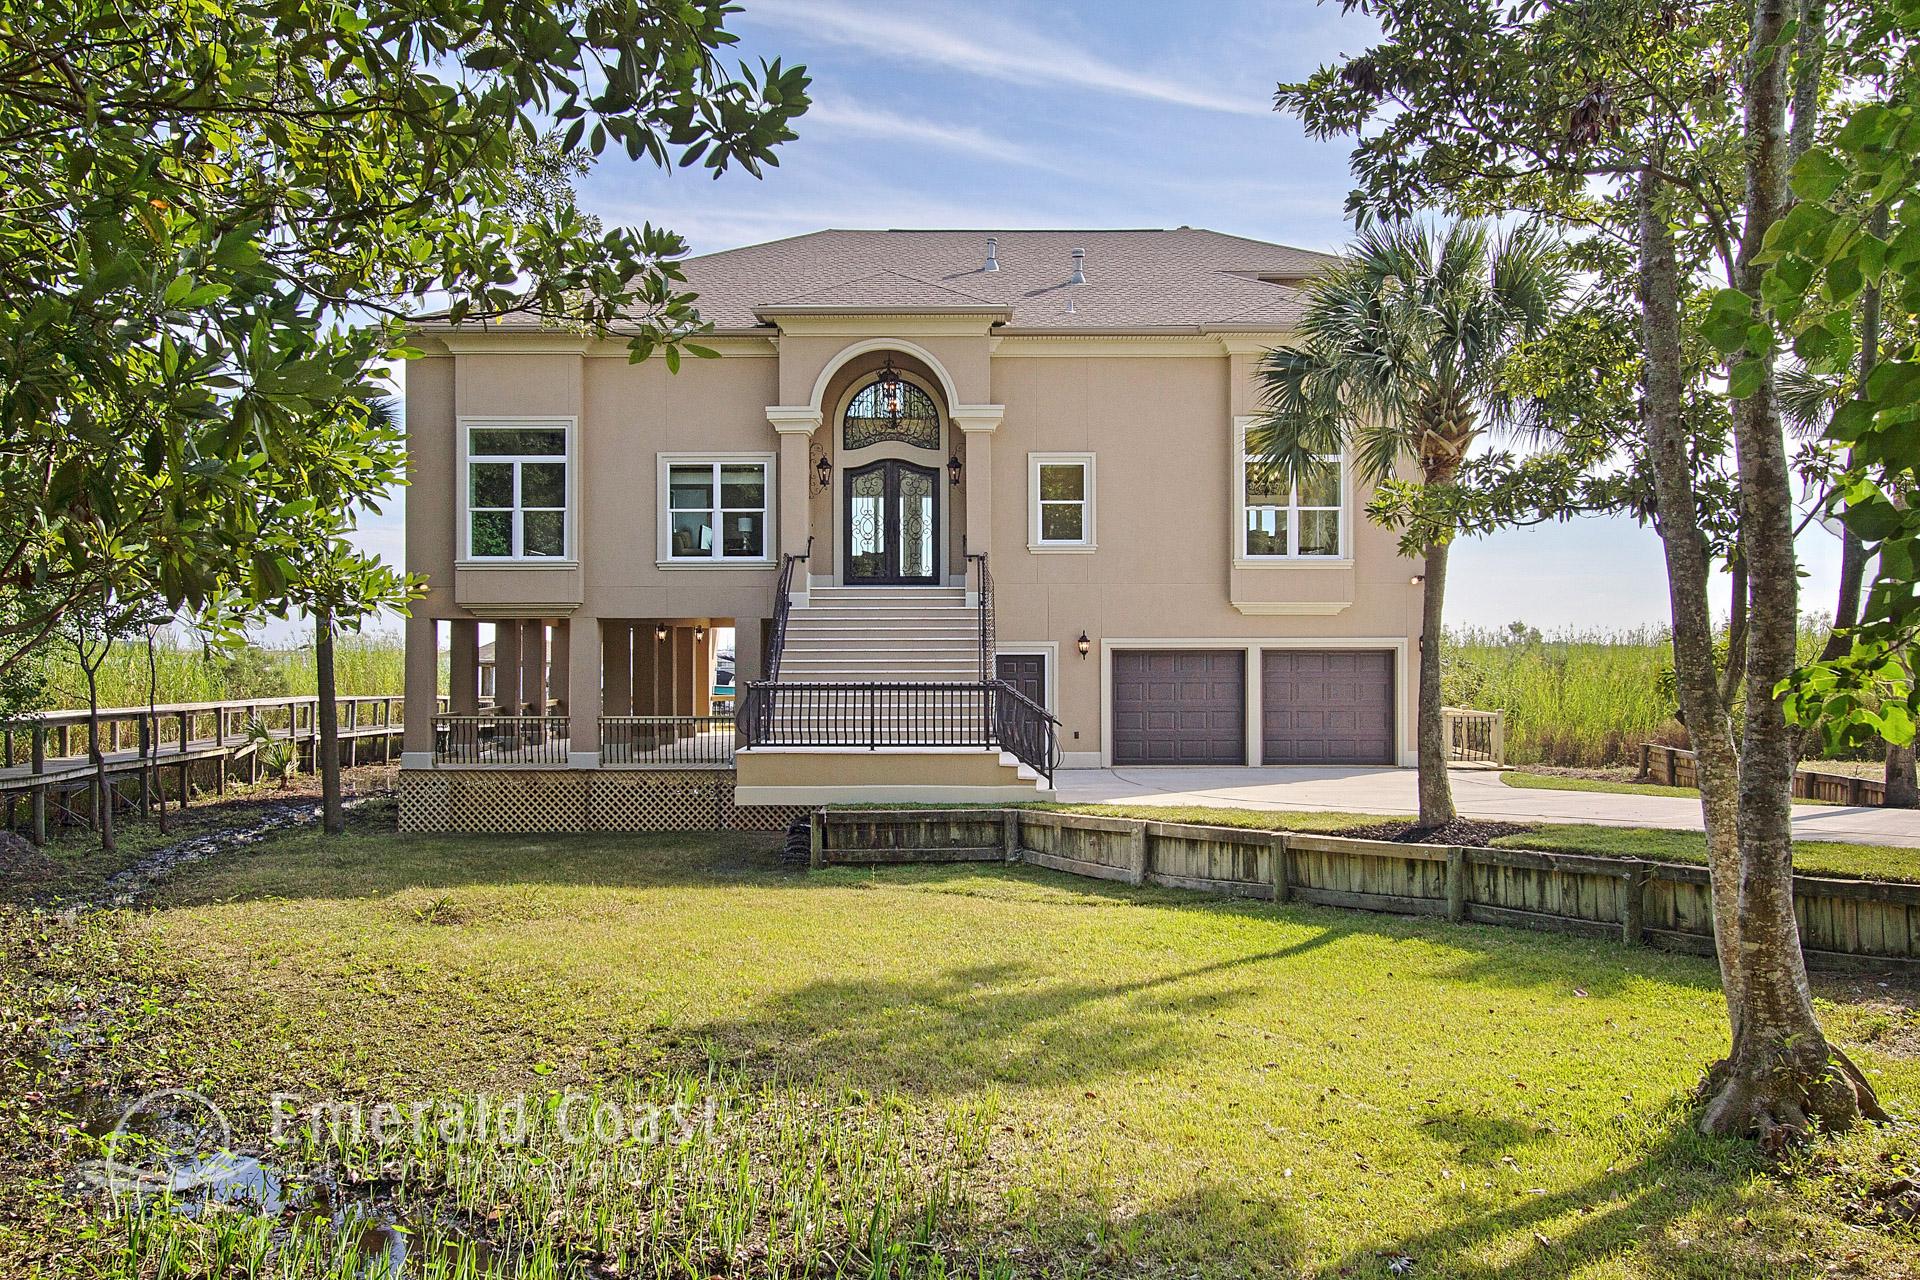 Craigslist Fort Walton Beach >> Emerald Coast Real Estate Photography » Fort Walton Beach ...